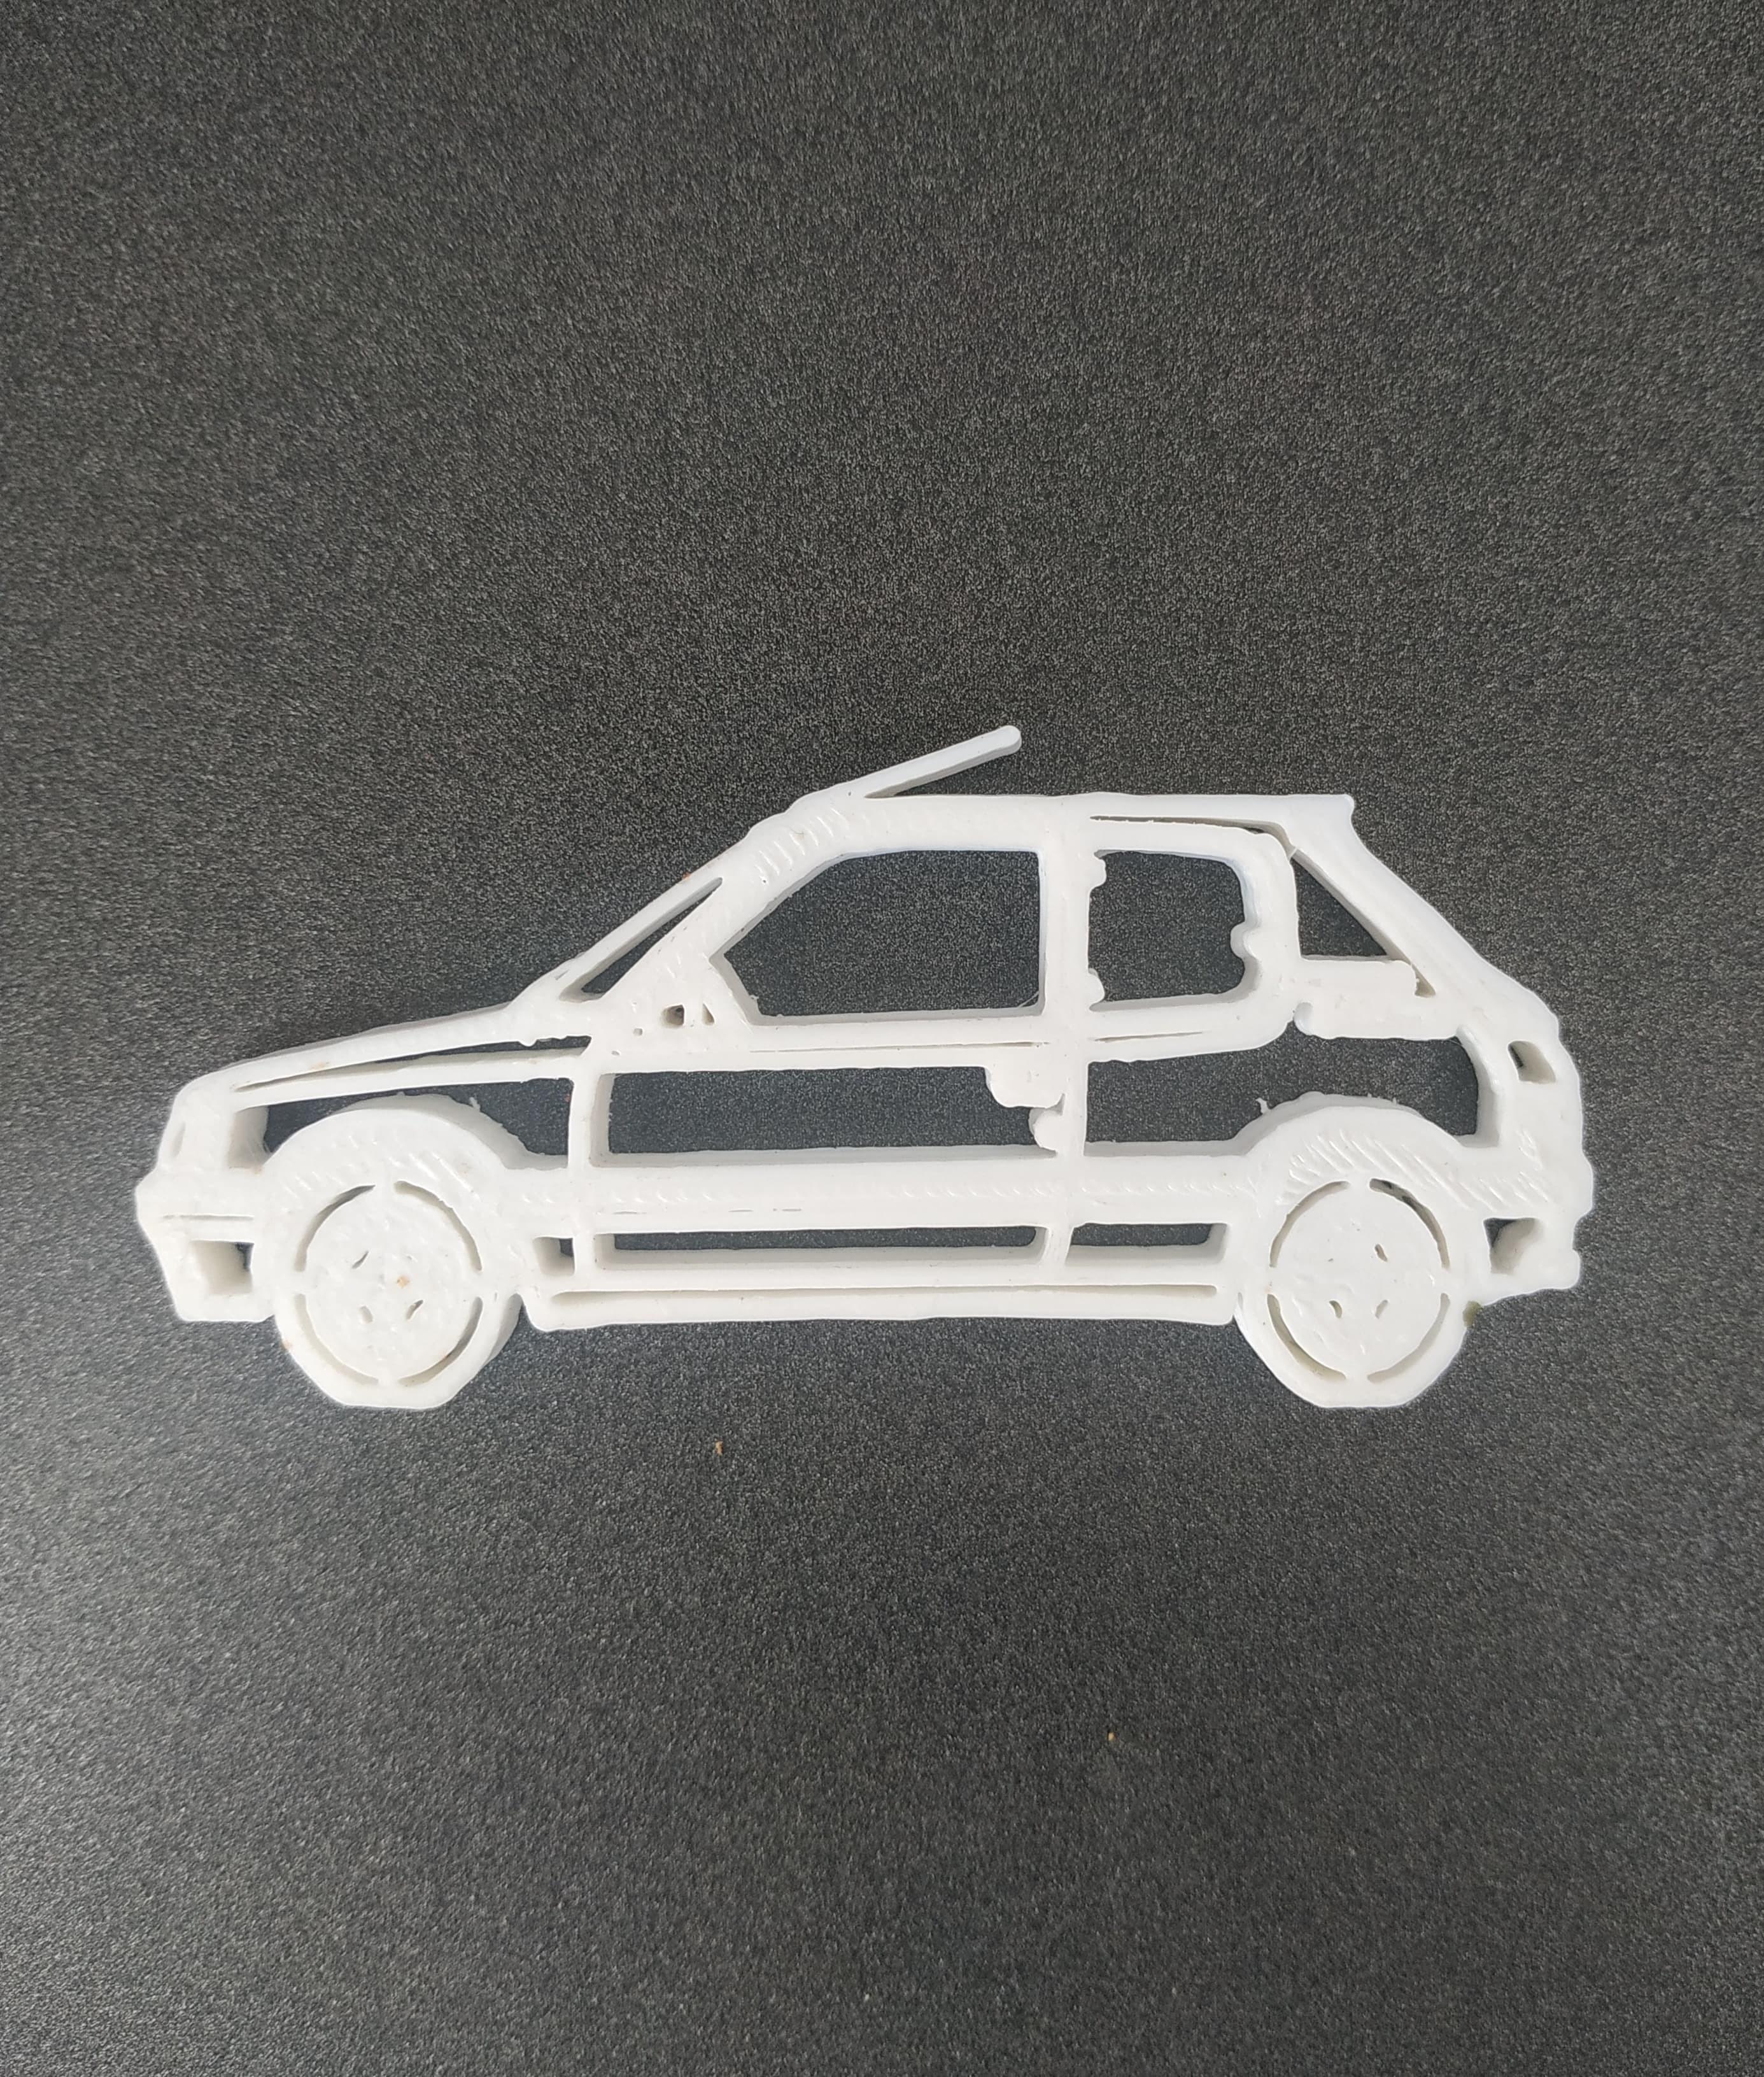 52979959_397204854175184_1258311283267076096_n.jpg Télécharger fichier STL Peugeot 205 keychain • Objet pour impression 3D, motek